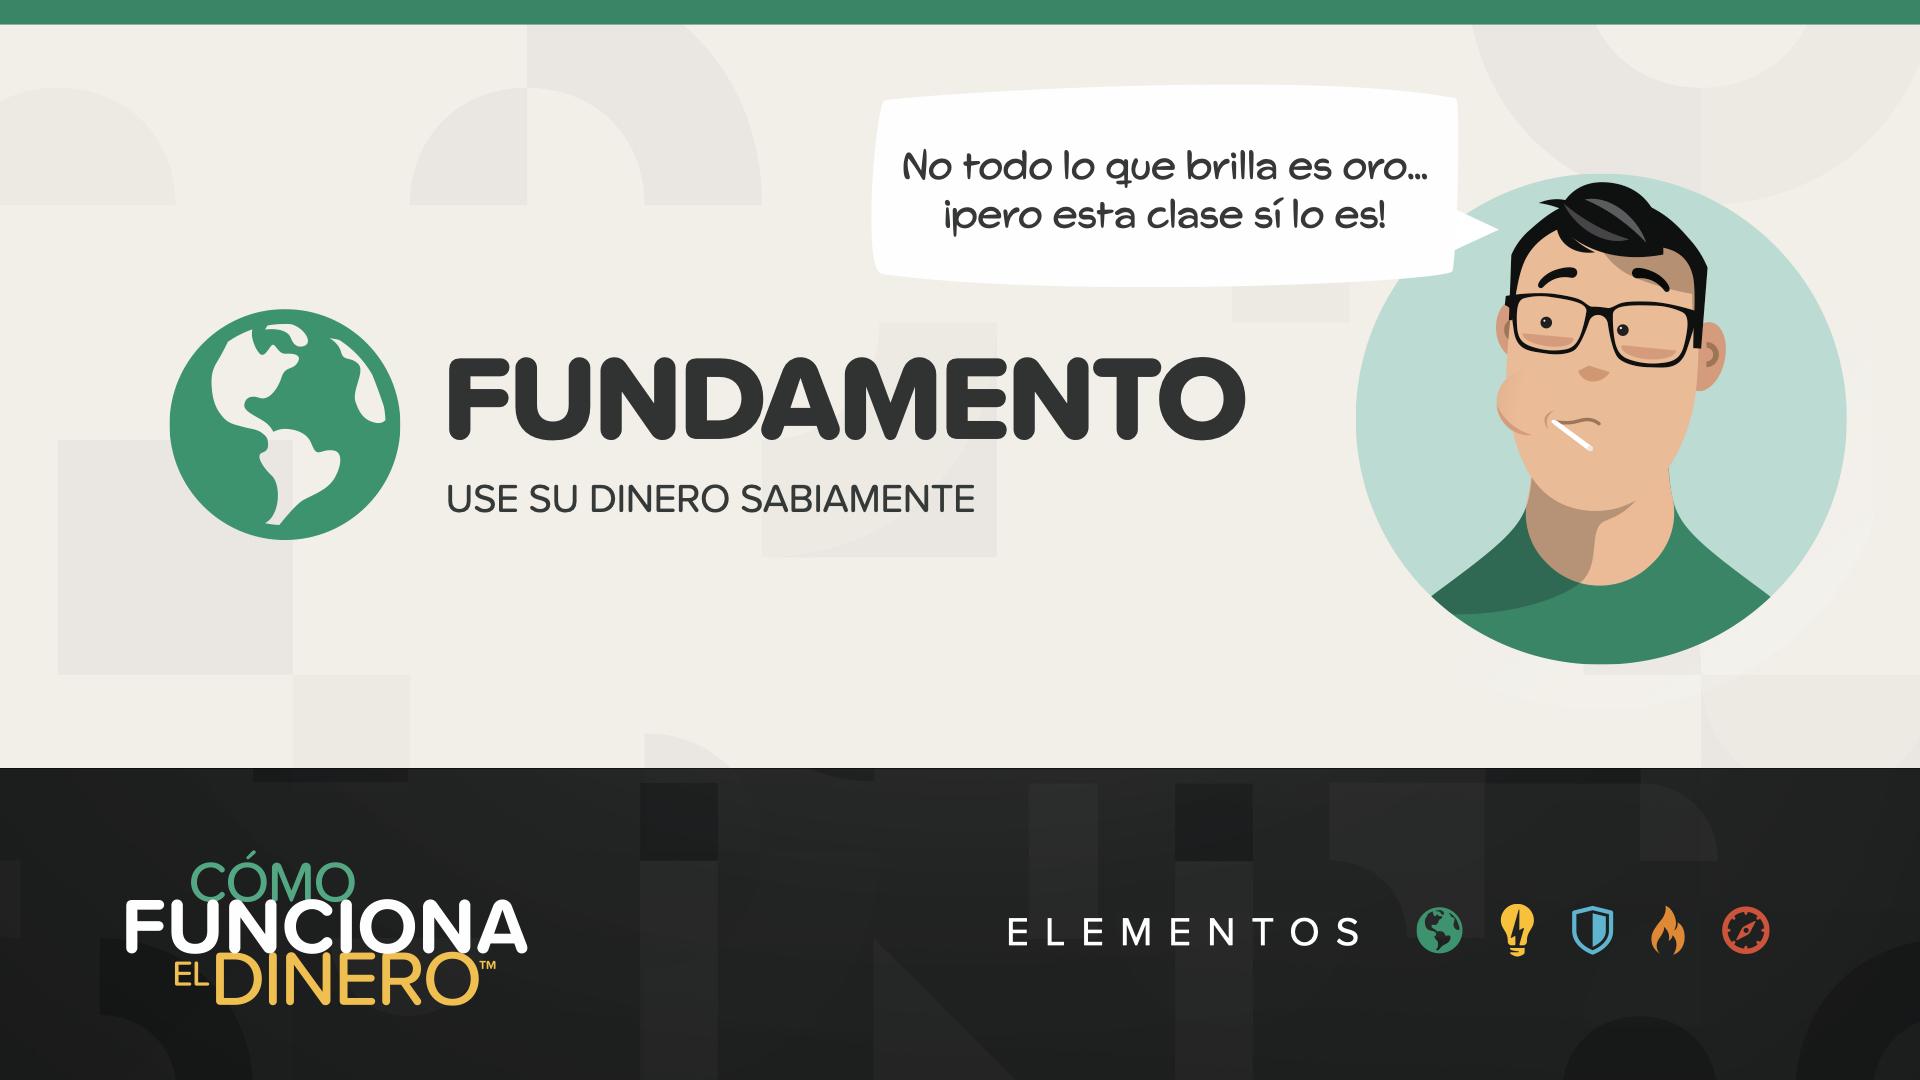 ELEMENTOS - Fundamento